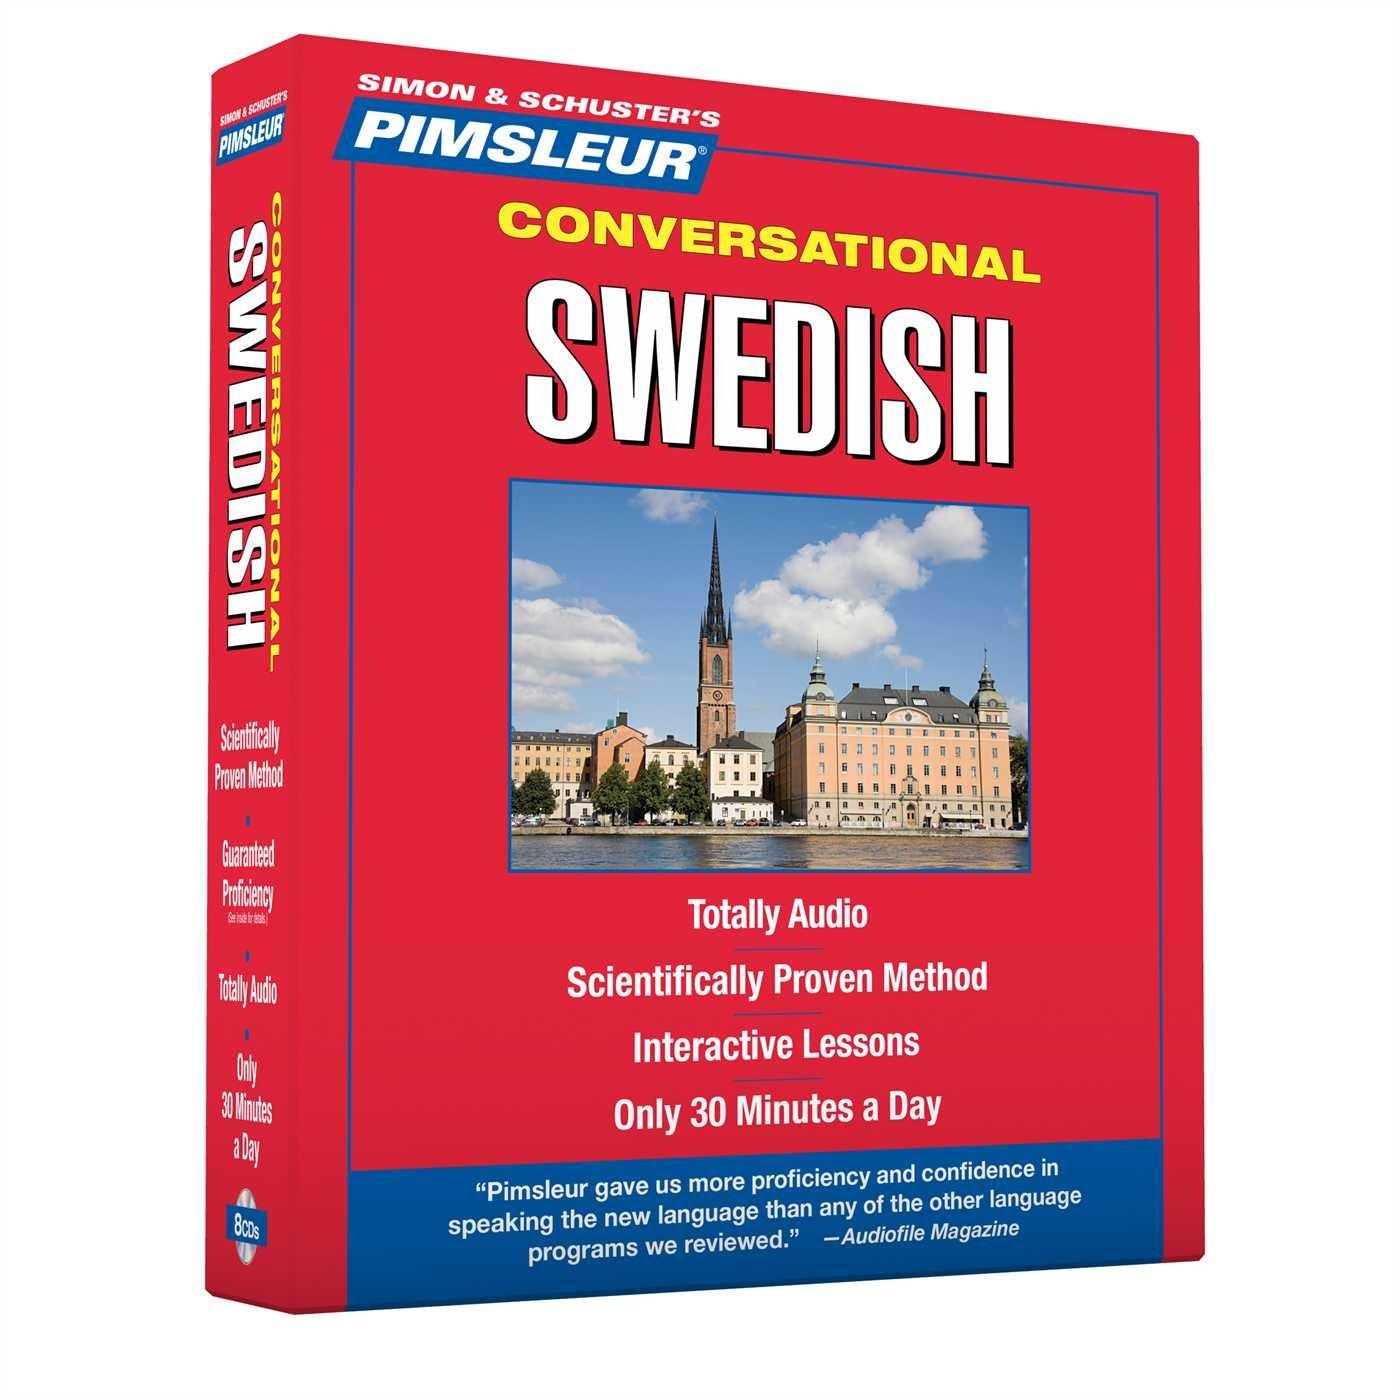 Pimsleur Conversational Swedish